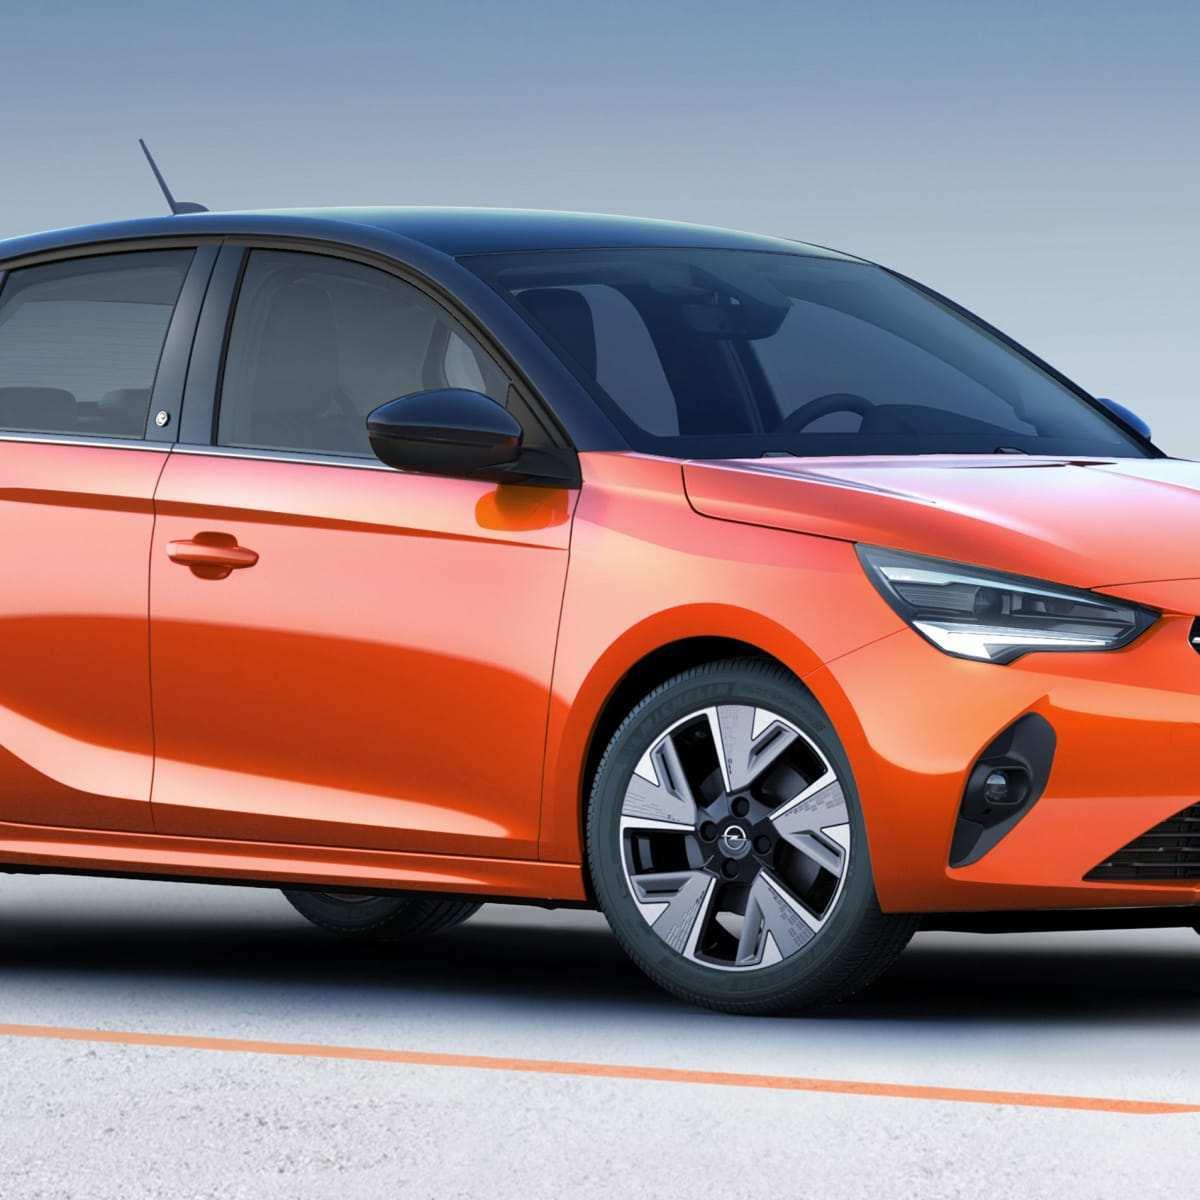 35 New Opel Ecorsa 2020 Exterior and Interior for Opel Ecorsa 2020